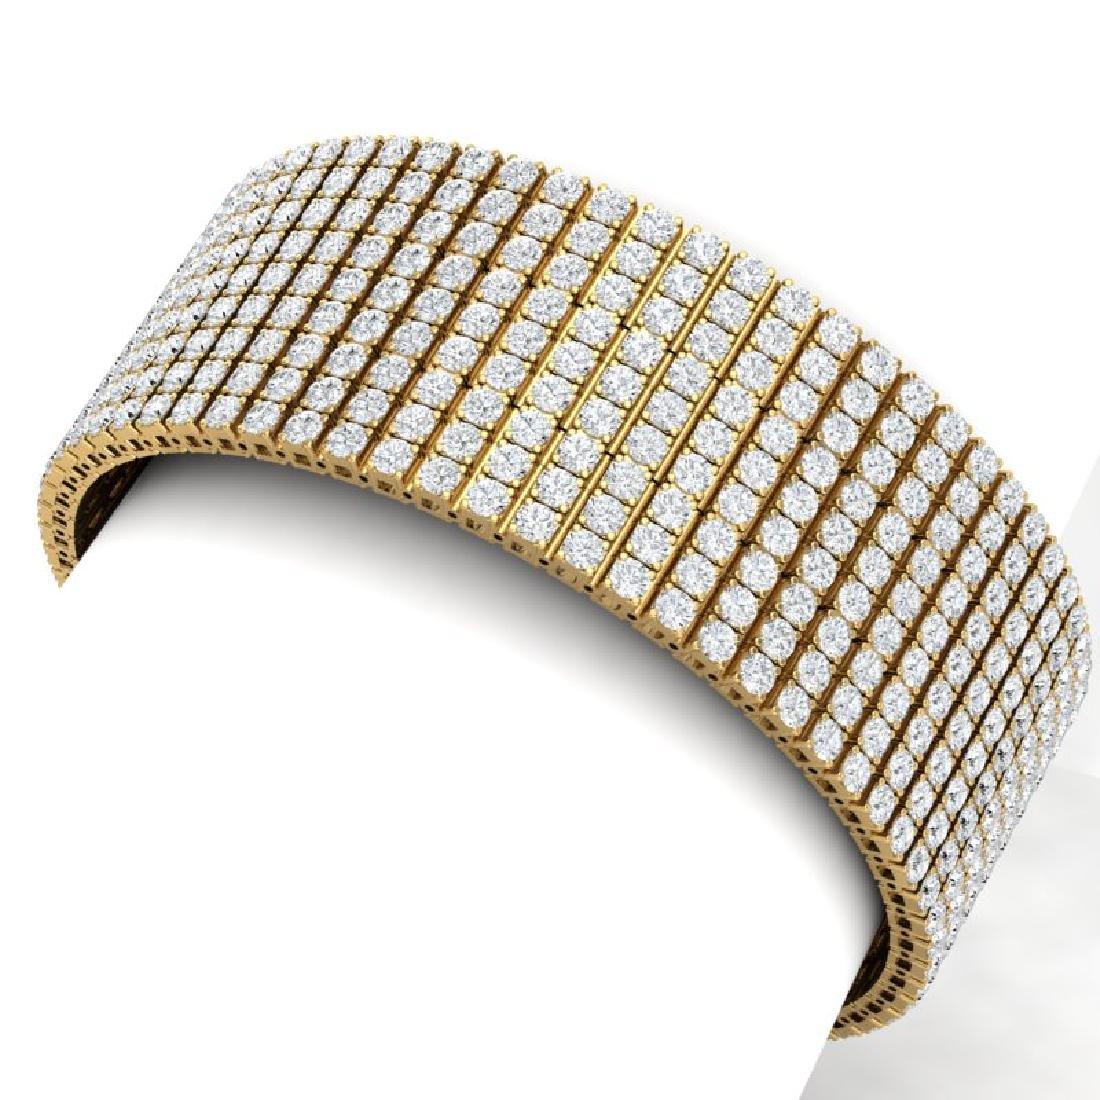 40 CTW Certified VS/SI Diamond Bracelet 18K Yellow Gold